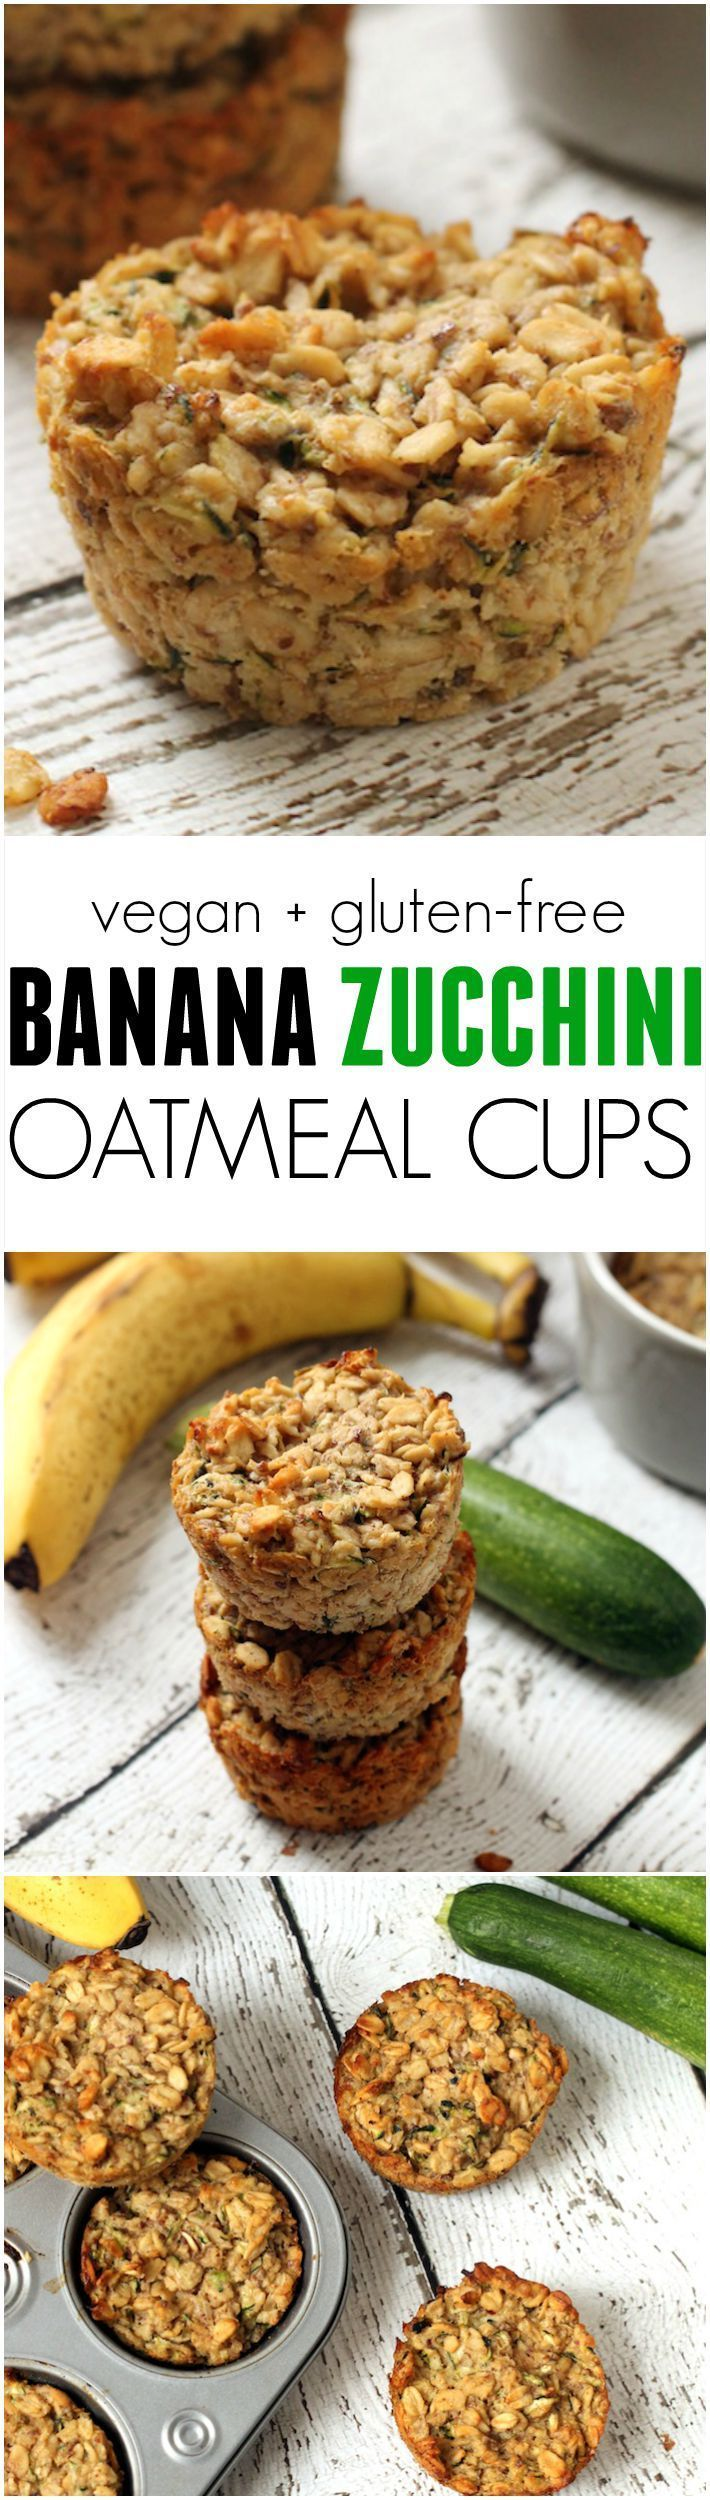 Banana Zucchini Oatmeal Cups + 5 Healthy Zucchini Recipes | Hummusapien | #recipe #Healthy @xhealthyrecipex |